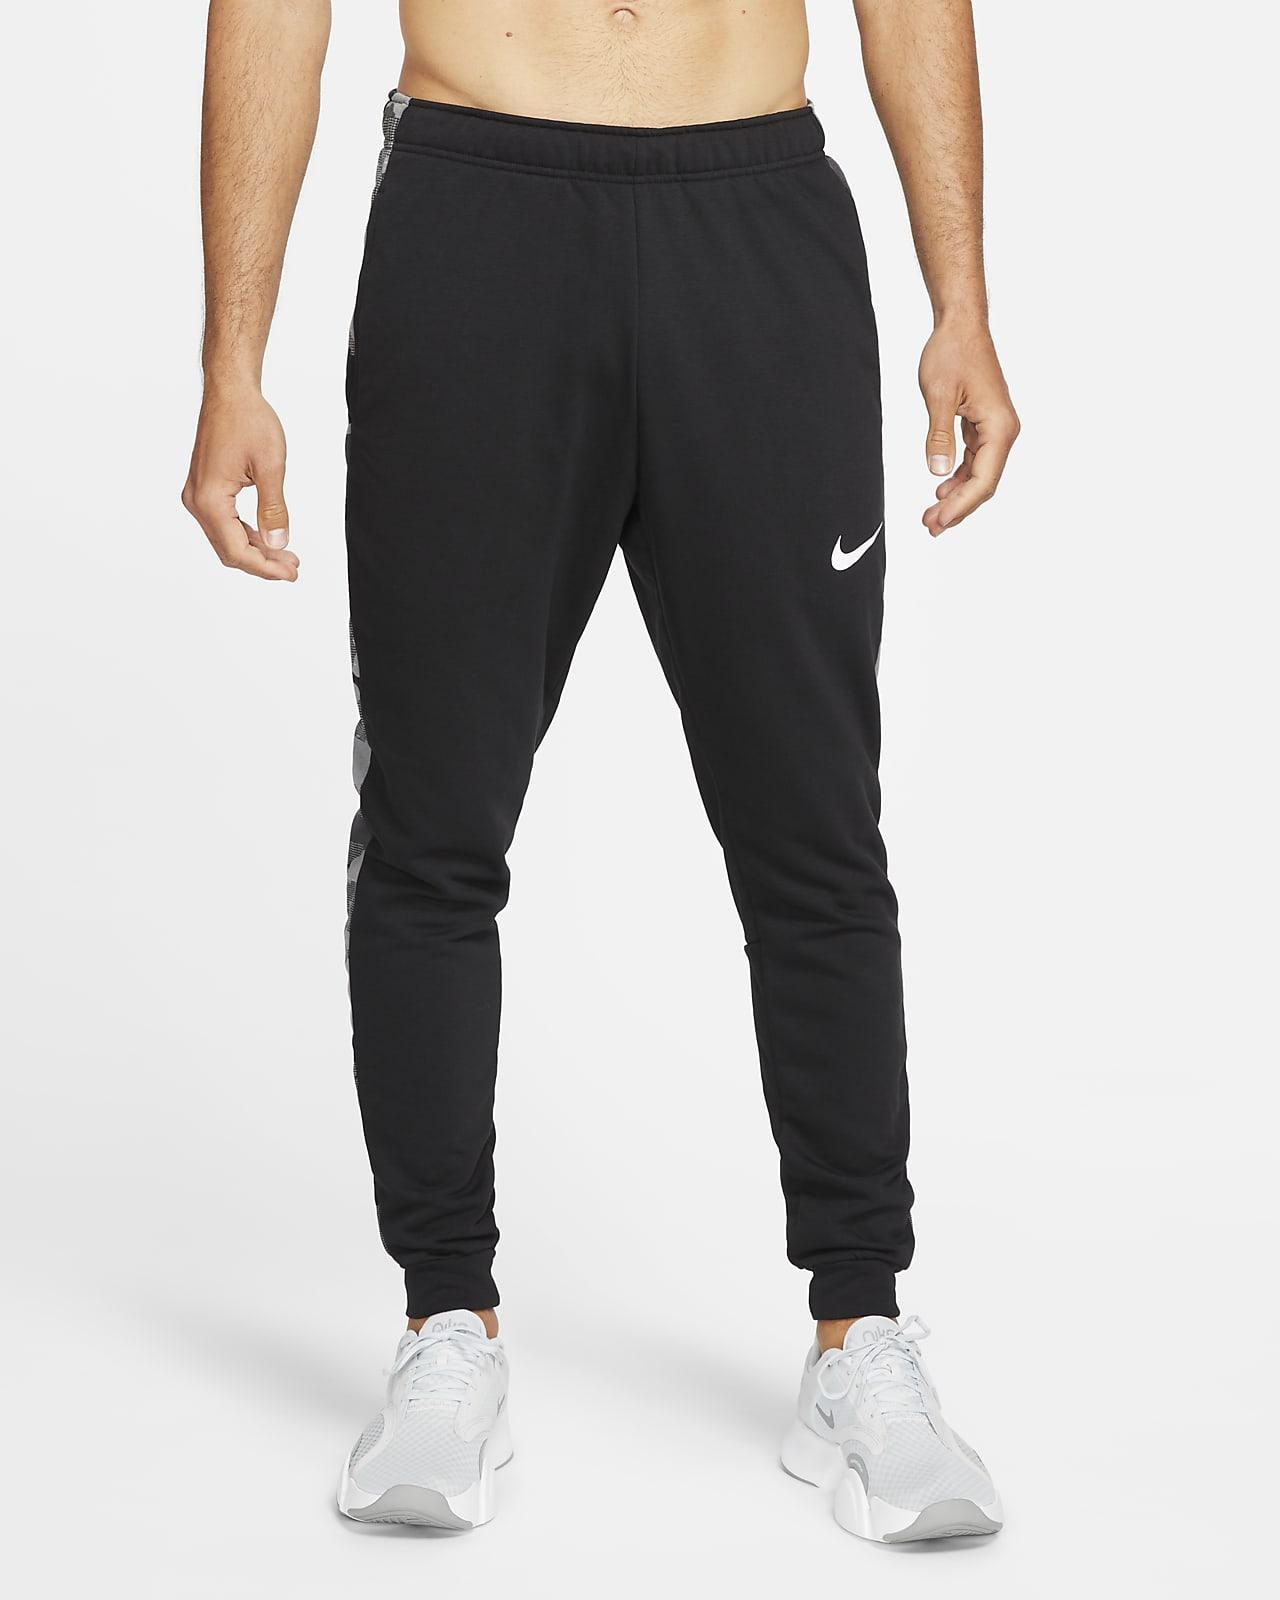 Nike Dri-FIT Men's Tapered Camo Training Trousers